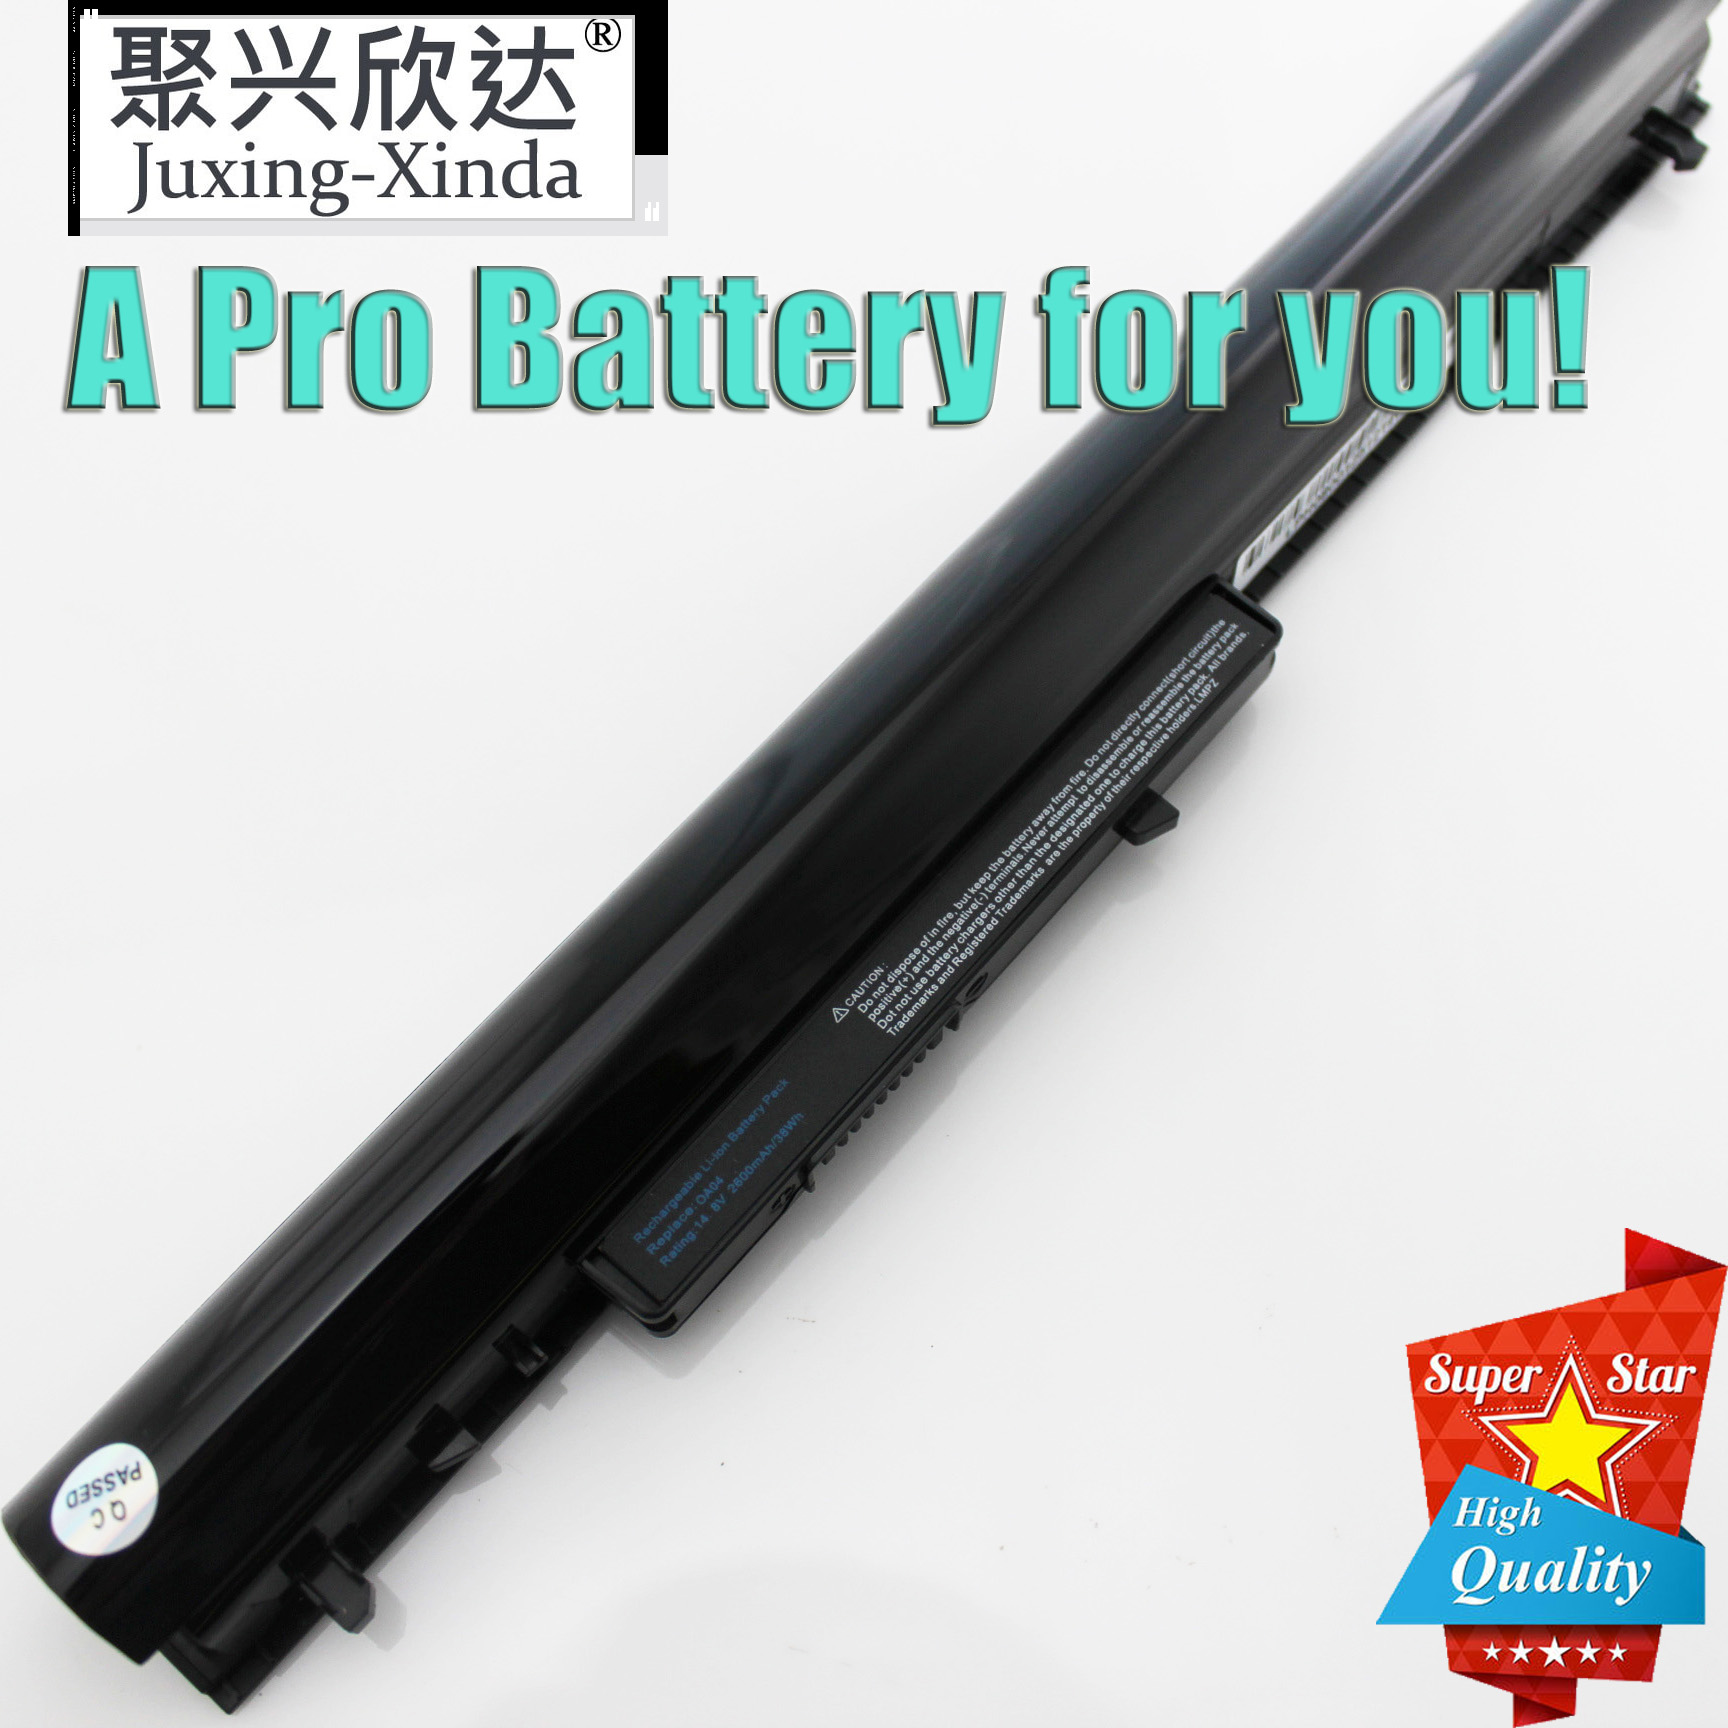 Spare 746641-001 OA03 OA04 Laptop Battery For HP 240 G2 Compaq Presario 15-h000 15-S000 CQ14 CQ15 740715-001 746458-421 14.8V PC(China)